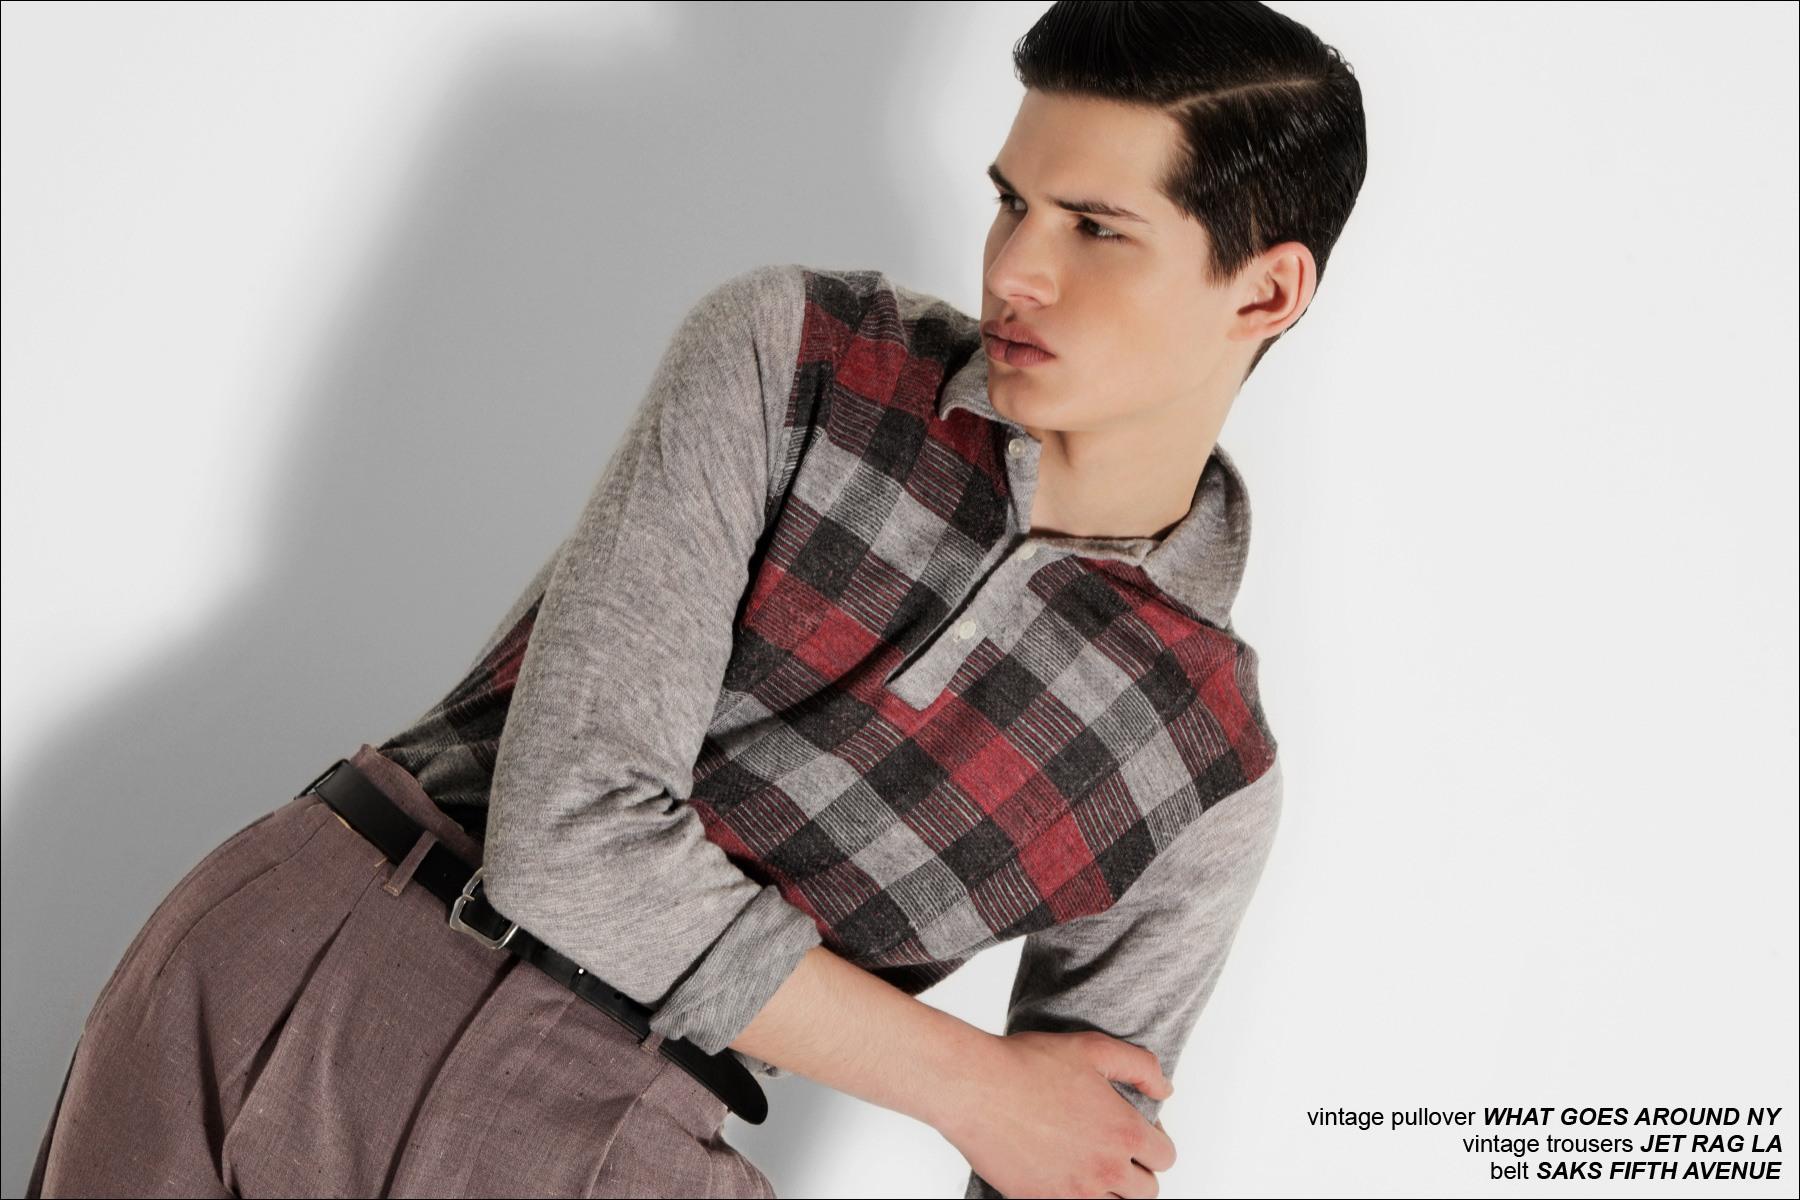 Fusion model Ben Stift photographed by Alexander Thompson for Ponyboy Magazine vintage men's editorial.